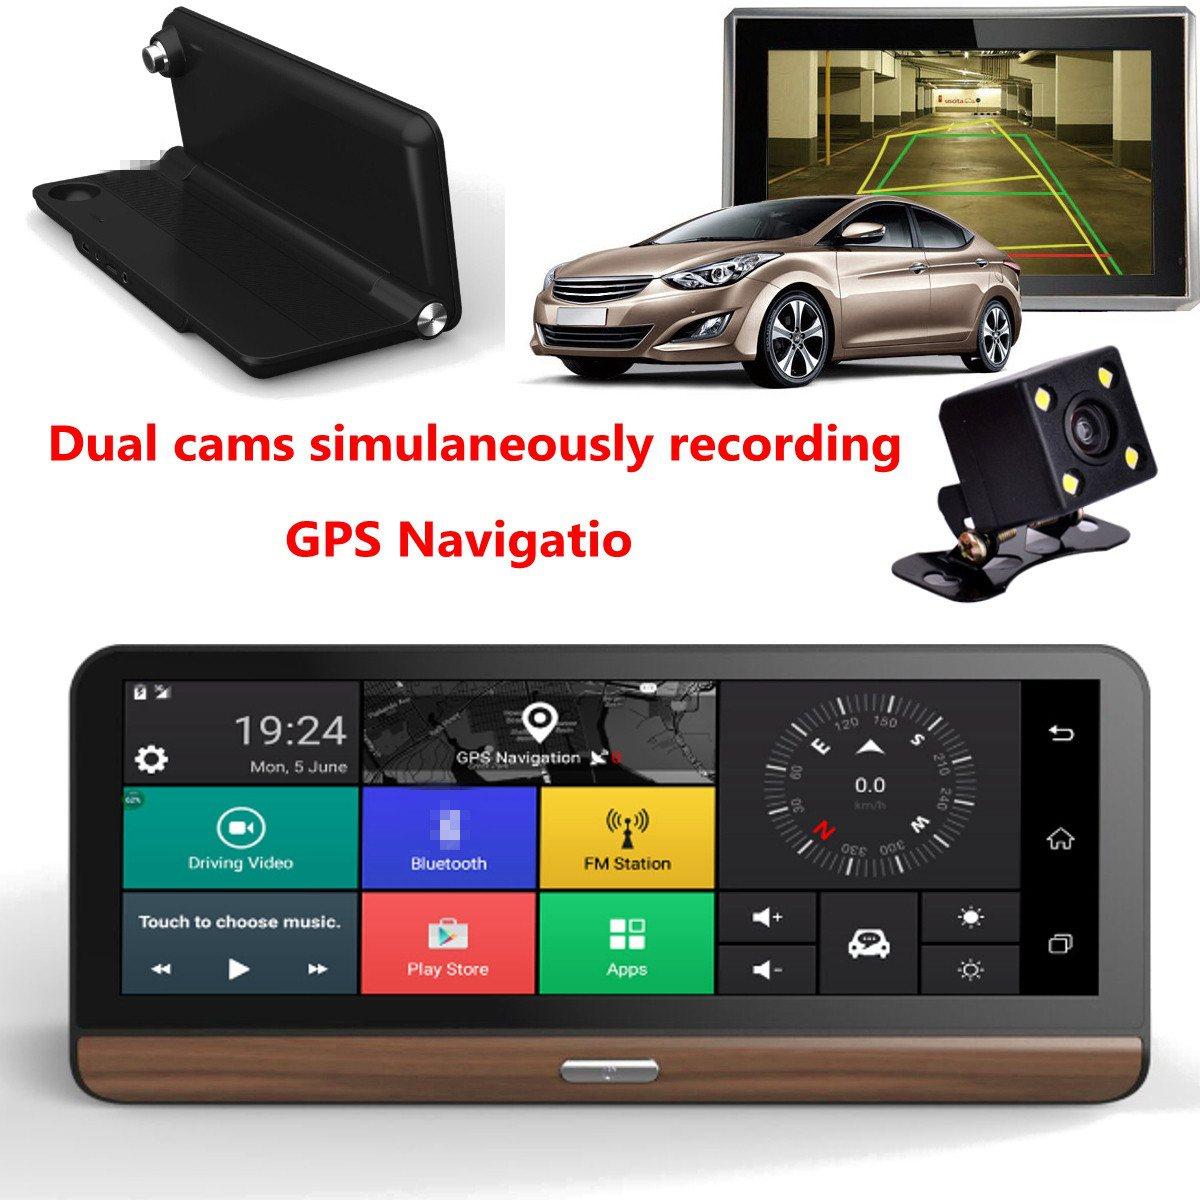 KROAK 8'' Touch Screen 4G Wifi Dual Car Dashboard Camera HD 1080P Car DVR Video GPS Rearview G-Sensor With EU+AU/US Map learning carpets us map carpet lc 201